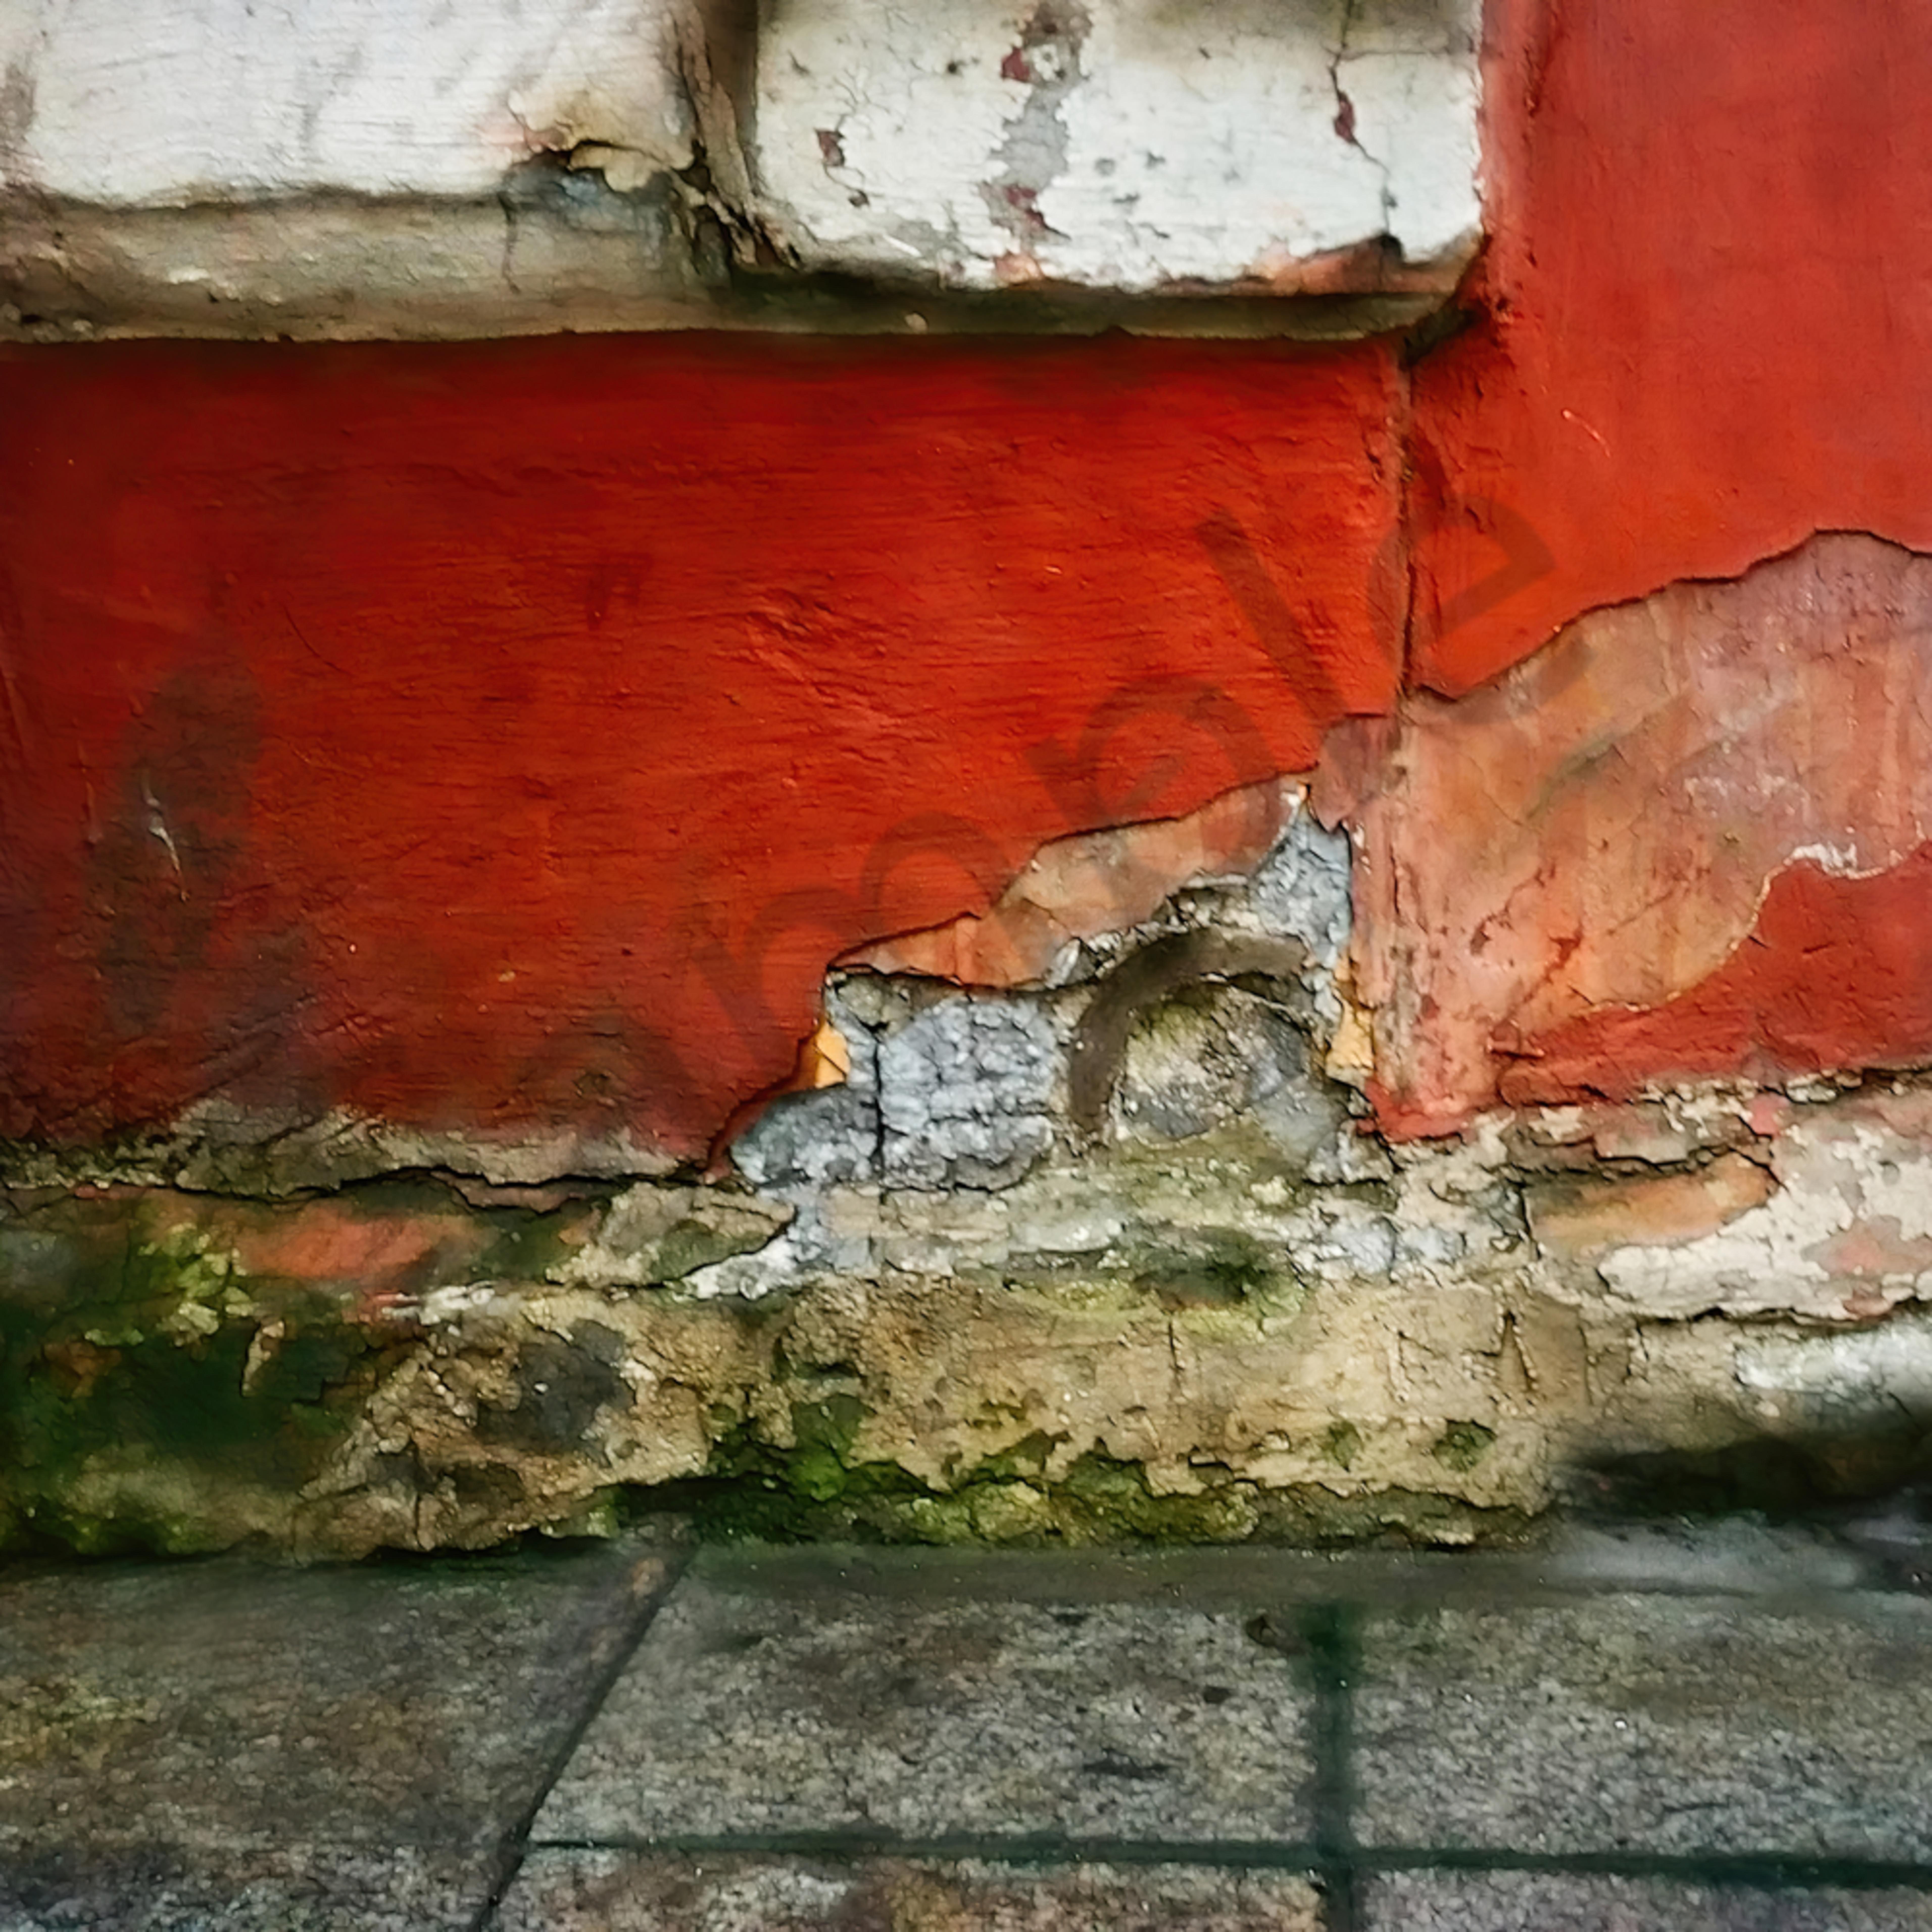 20190728 201506 03 inna dzhanibekova abstract wall website gp02 sjrbhr